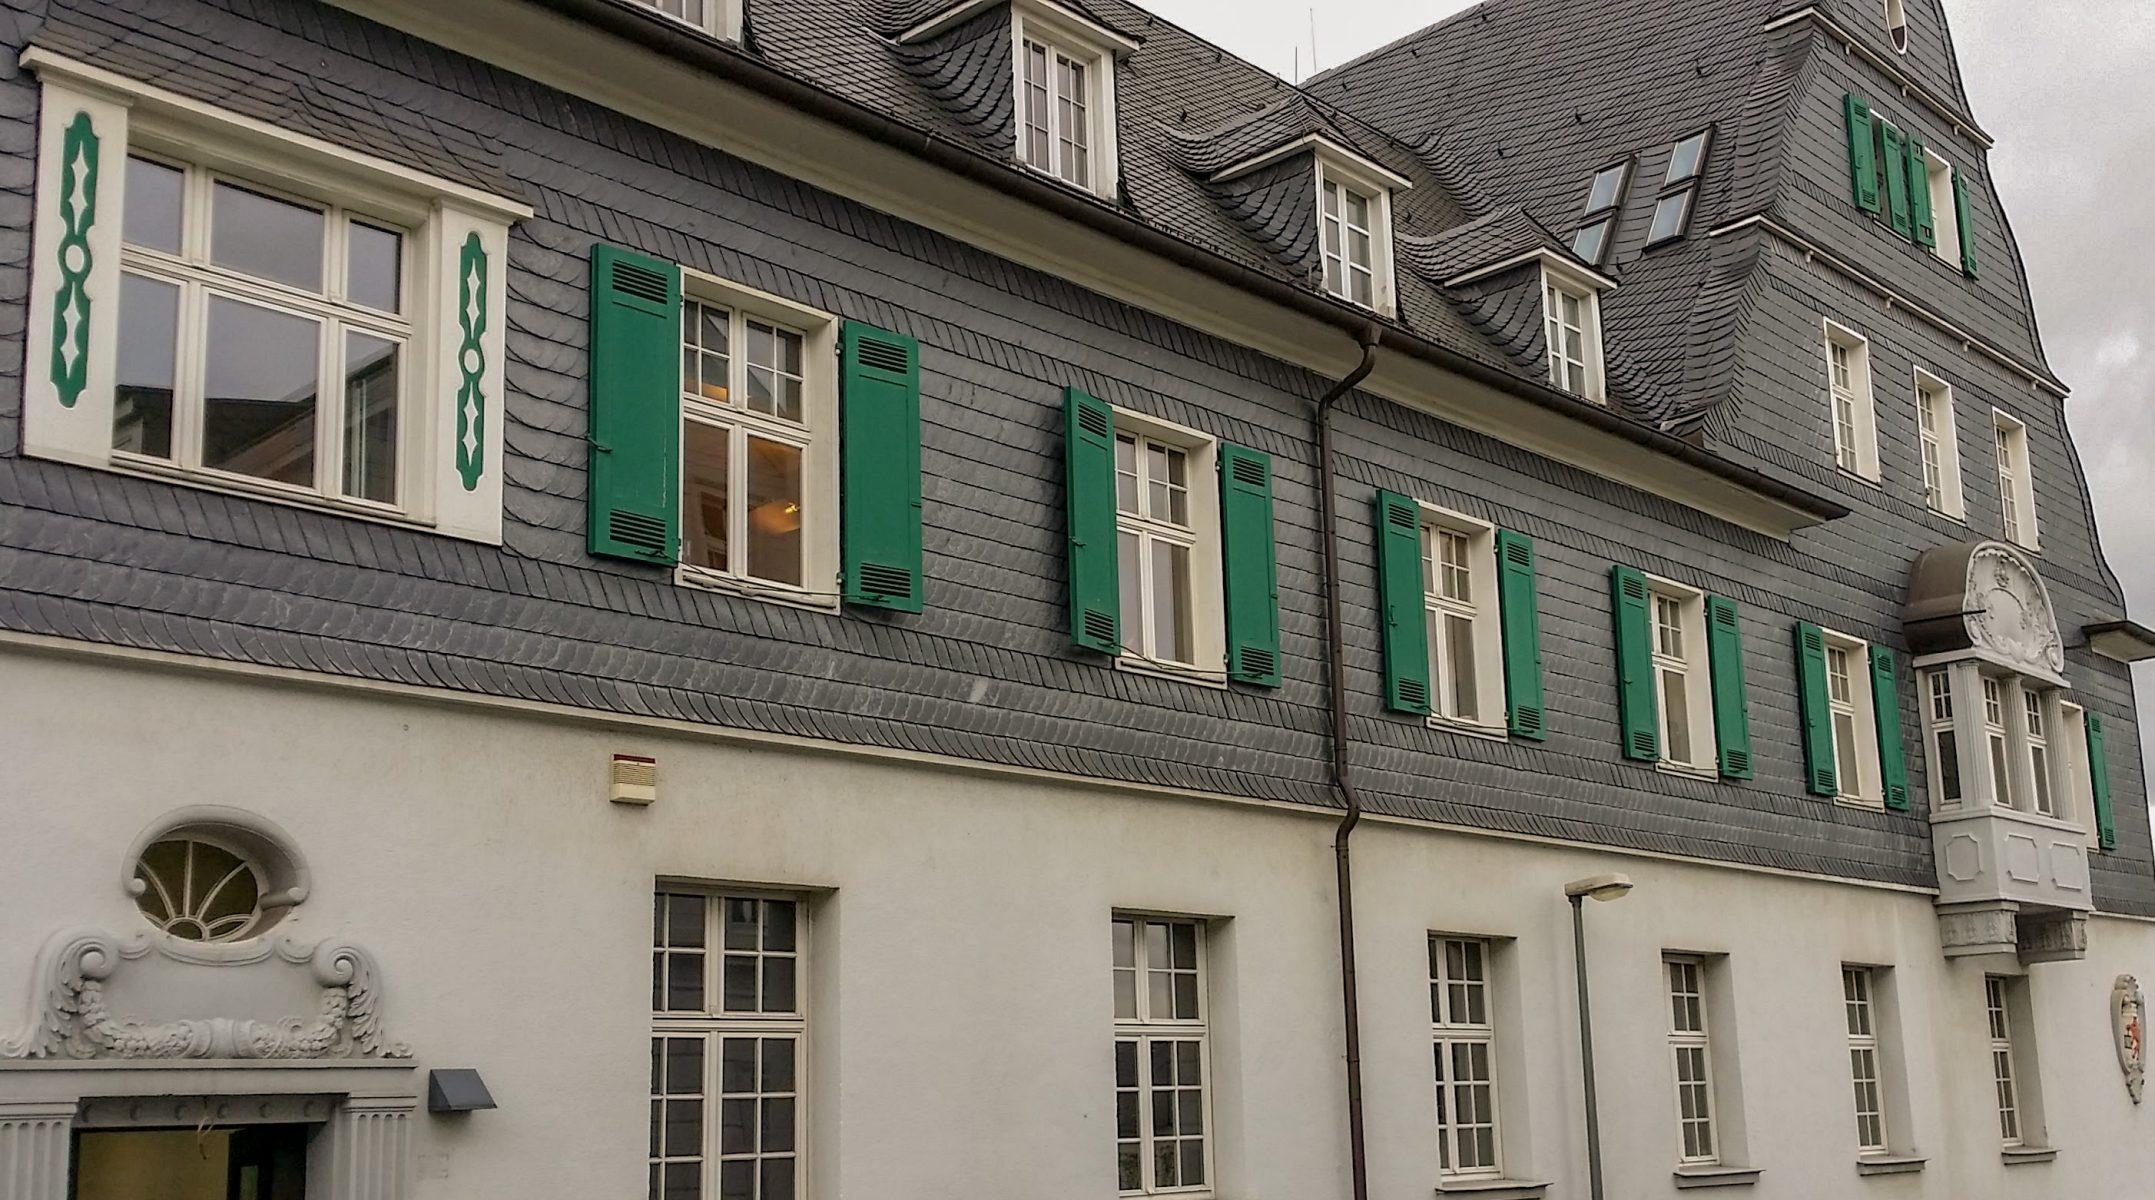 Immobiliengutachter im Bergischen Land